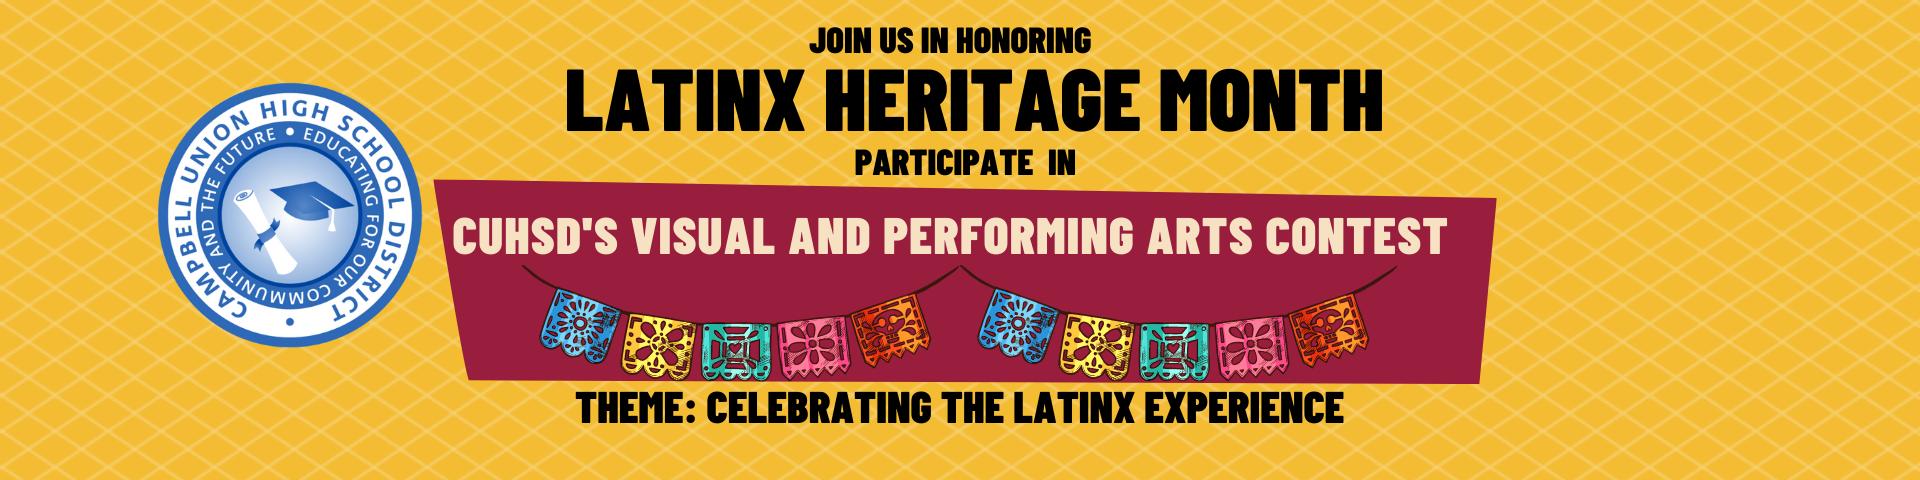 Latino Heritage Month Poster